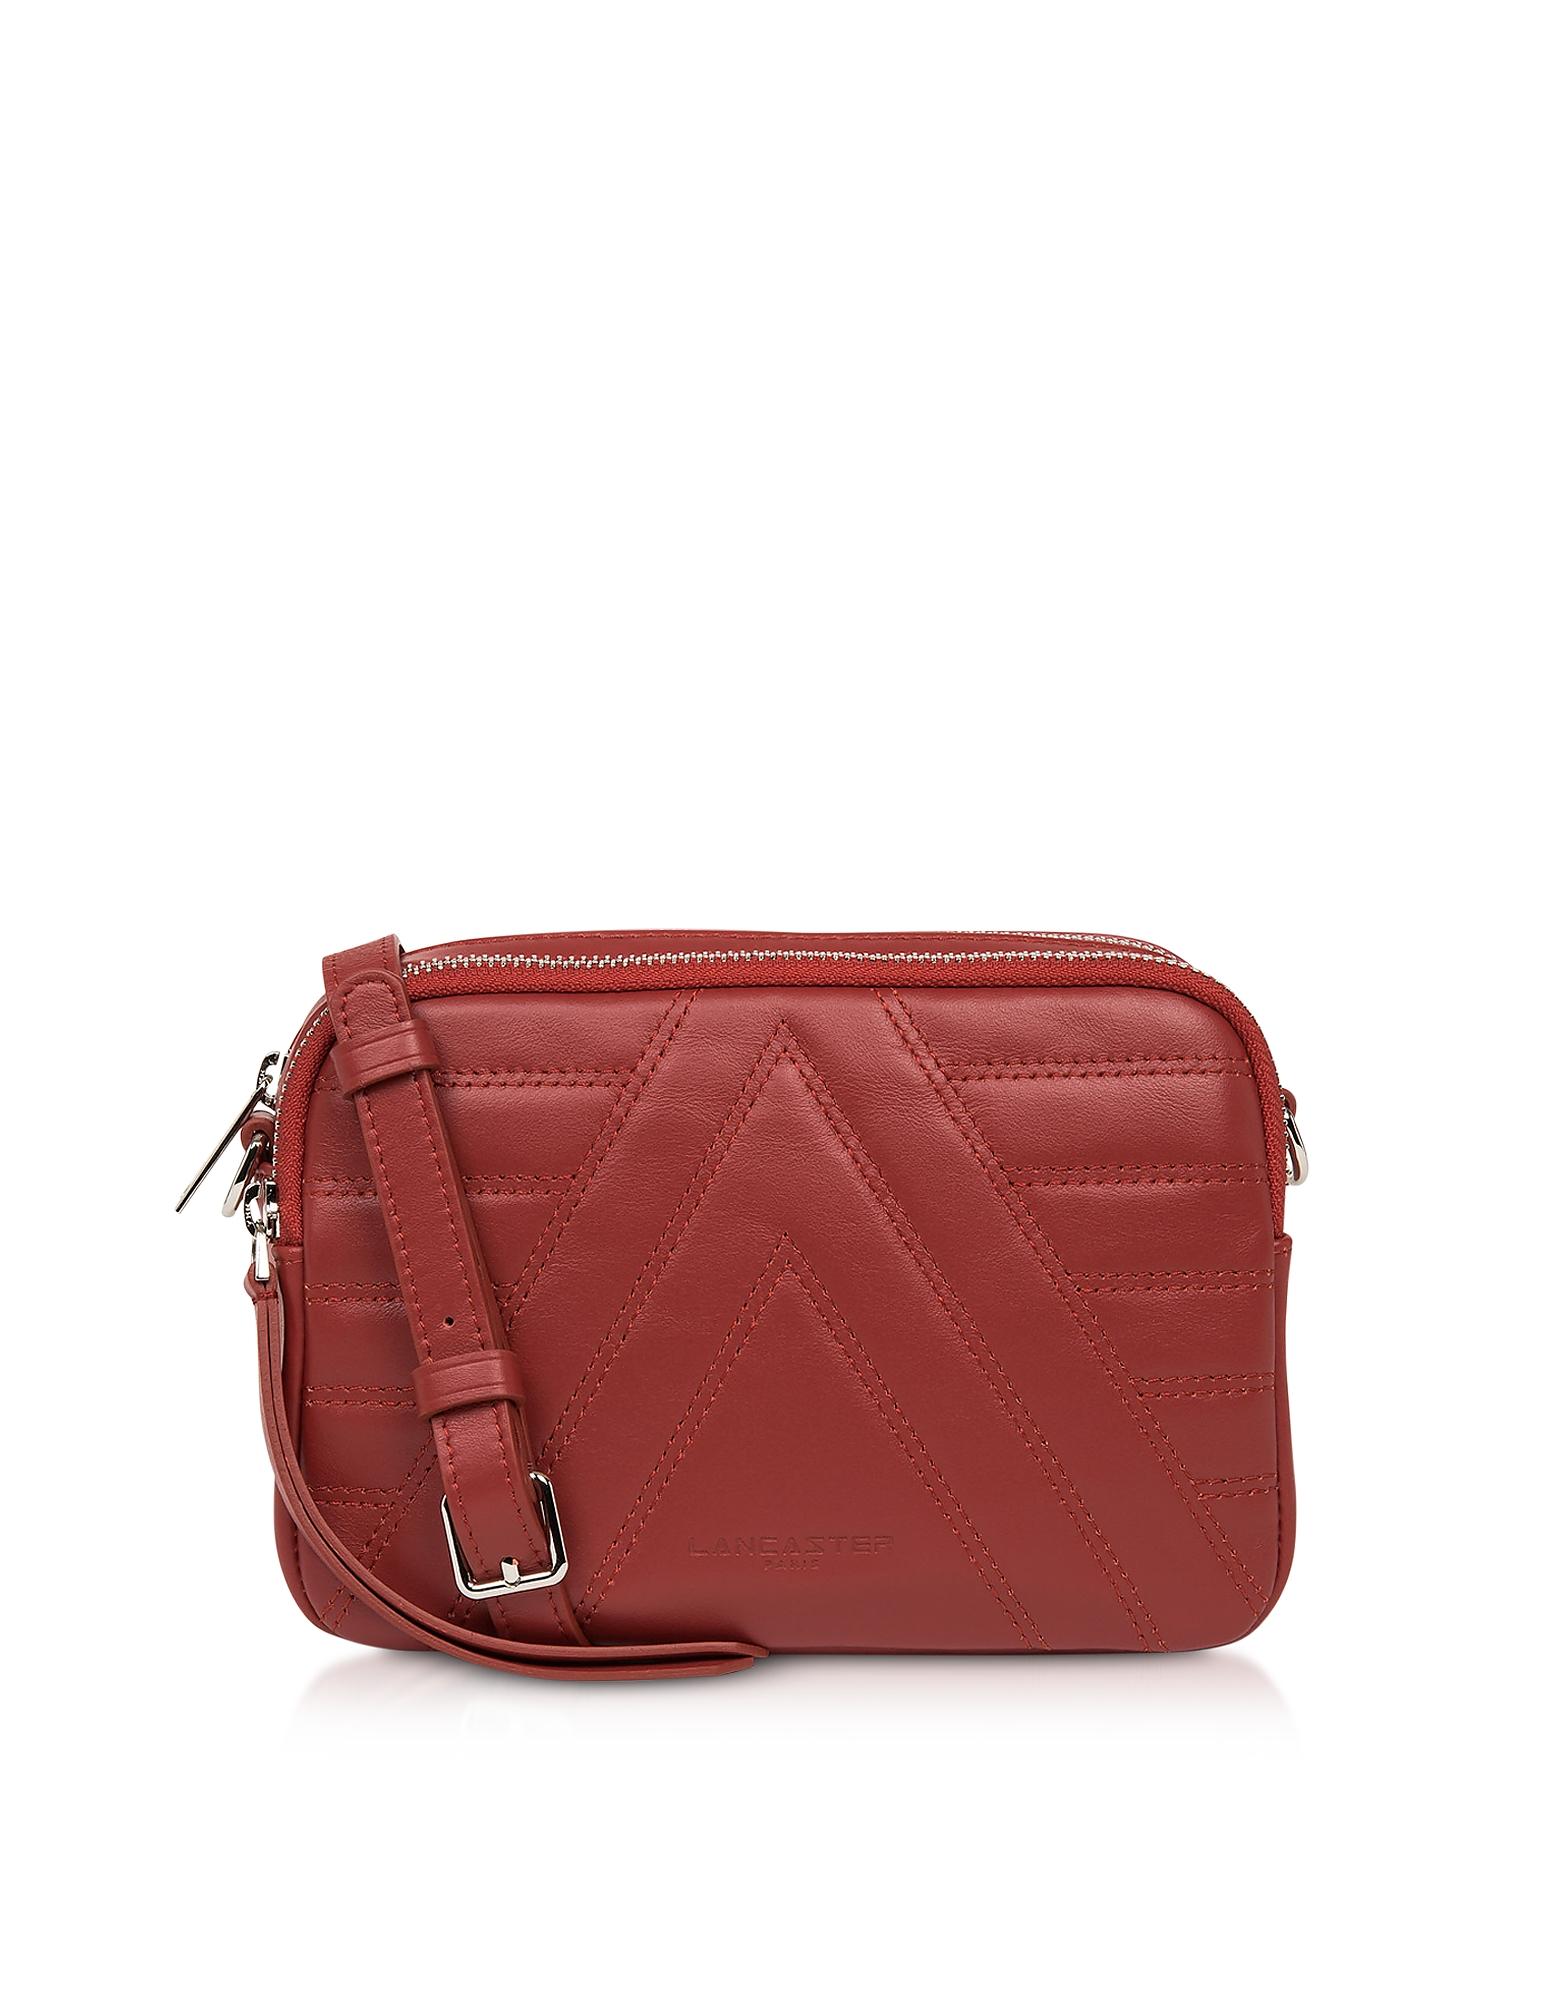 Lancaster Paris Designer Handbags, Red Parisienne Quilted Leather Crossbody Bag